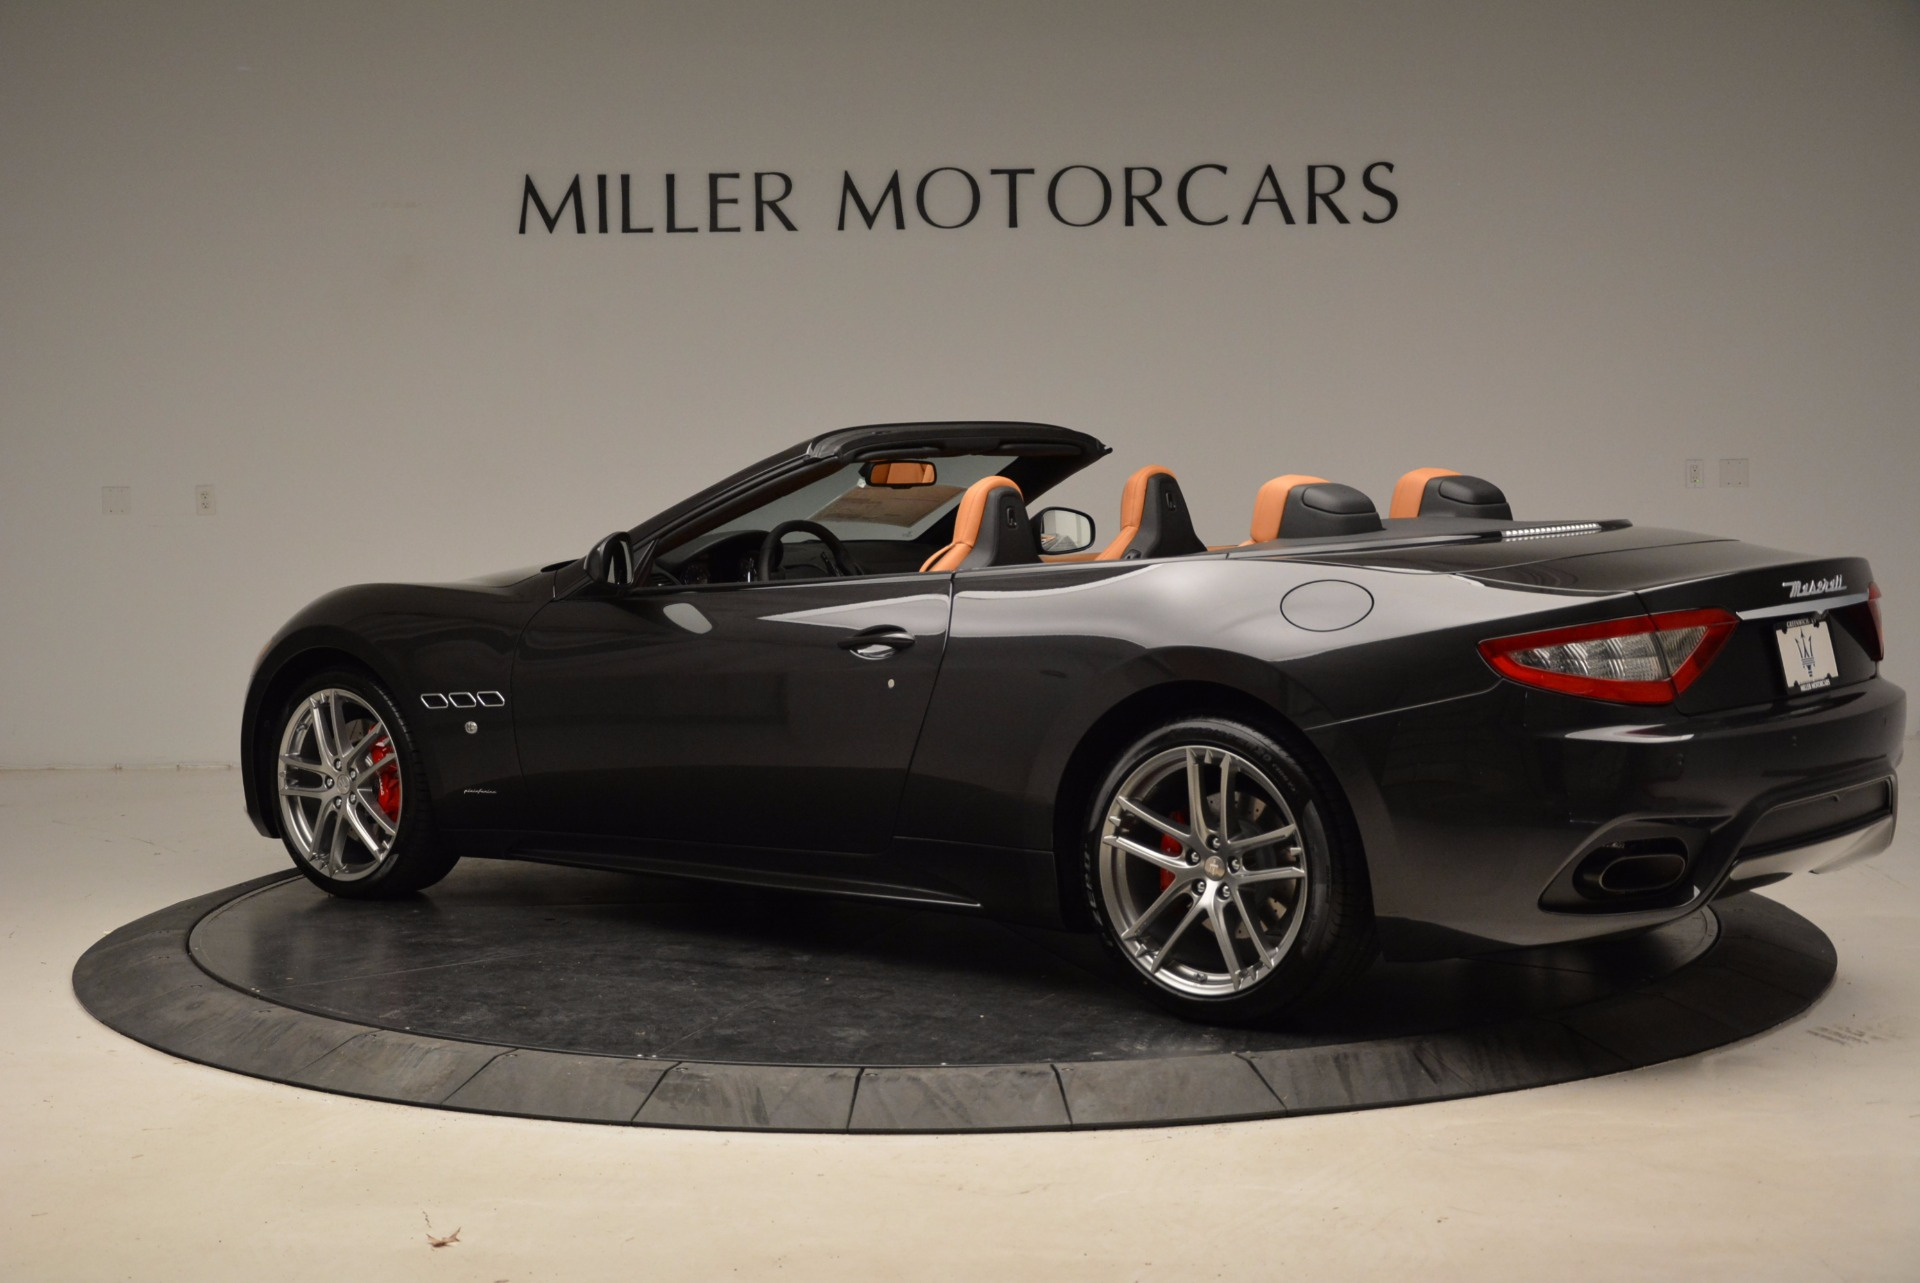 New 2018 Maserati GranTurismo Sport Convertible For Sale In Westport, CT 1869_p16